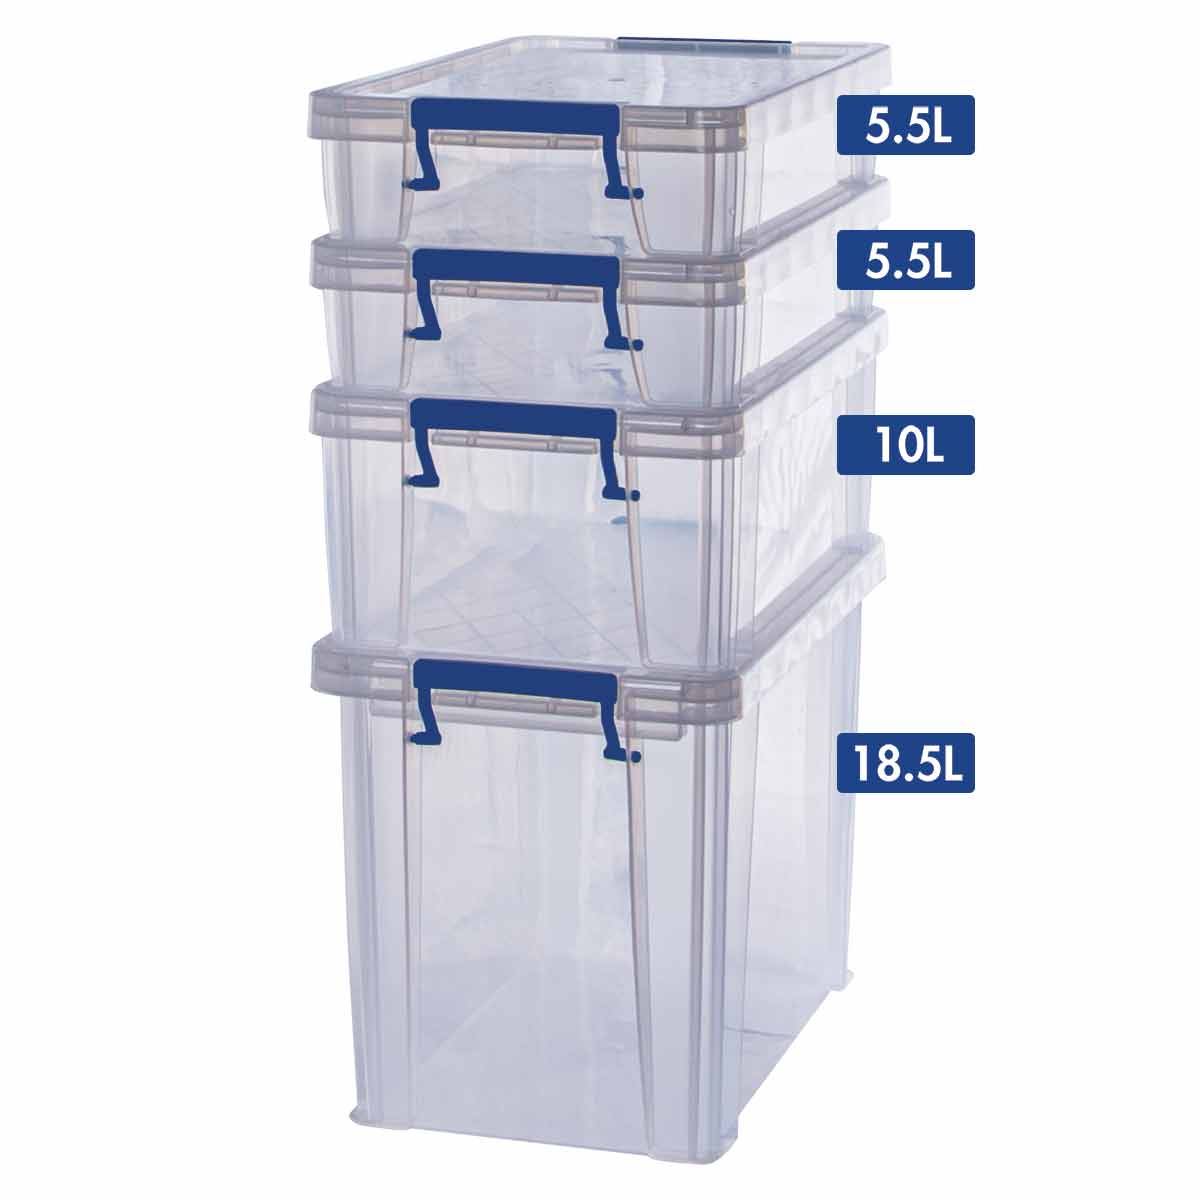 Image of ProStore Storage Box Bonus Pack 5 39.5L Capacity, Clear